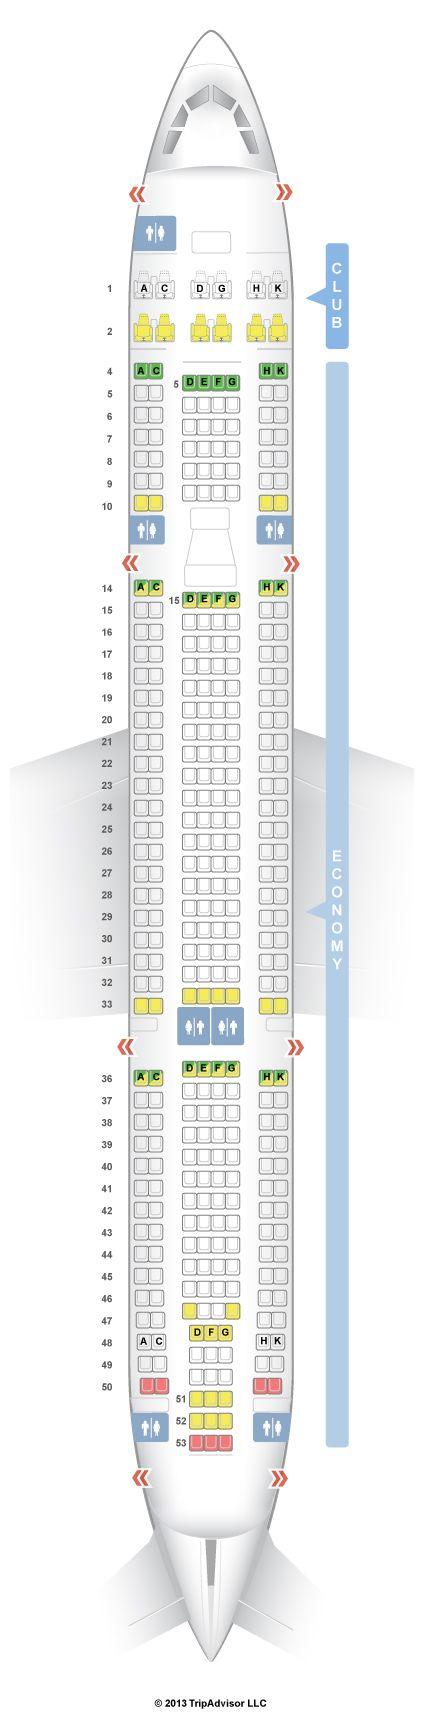 SeatGuru Seat Map Air Transat Airbus A330-300 (333) New Business